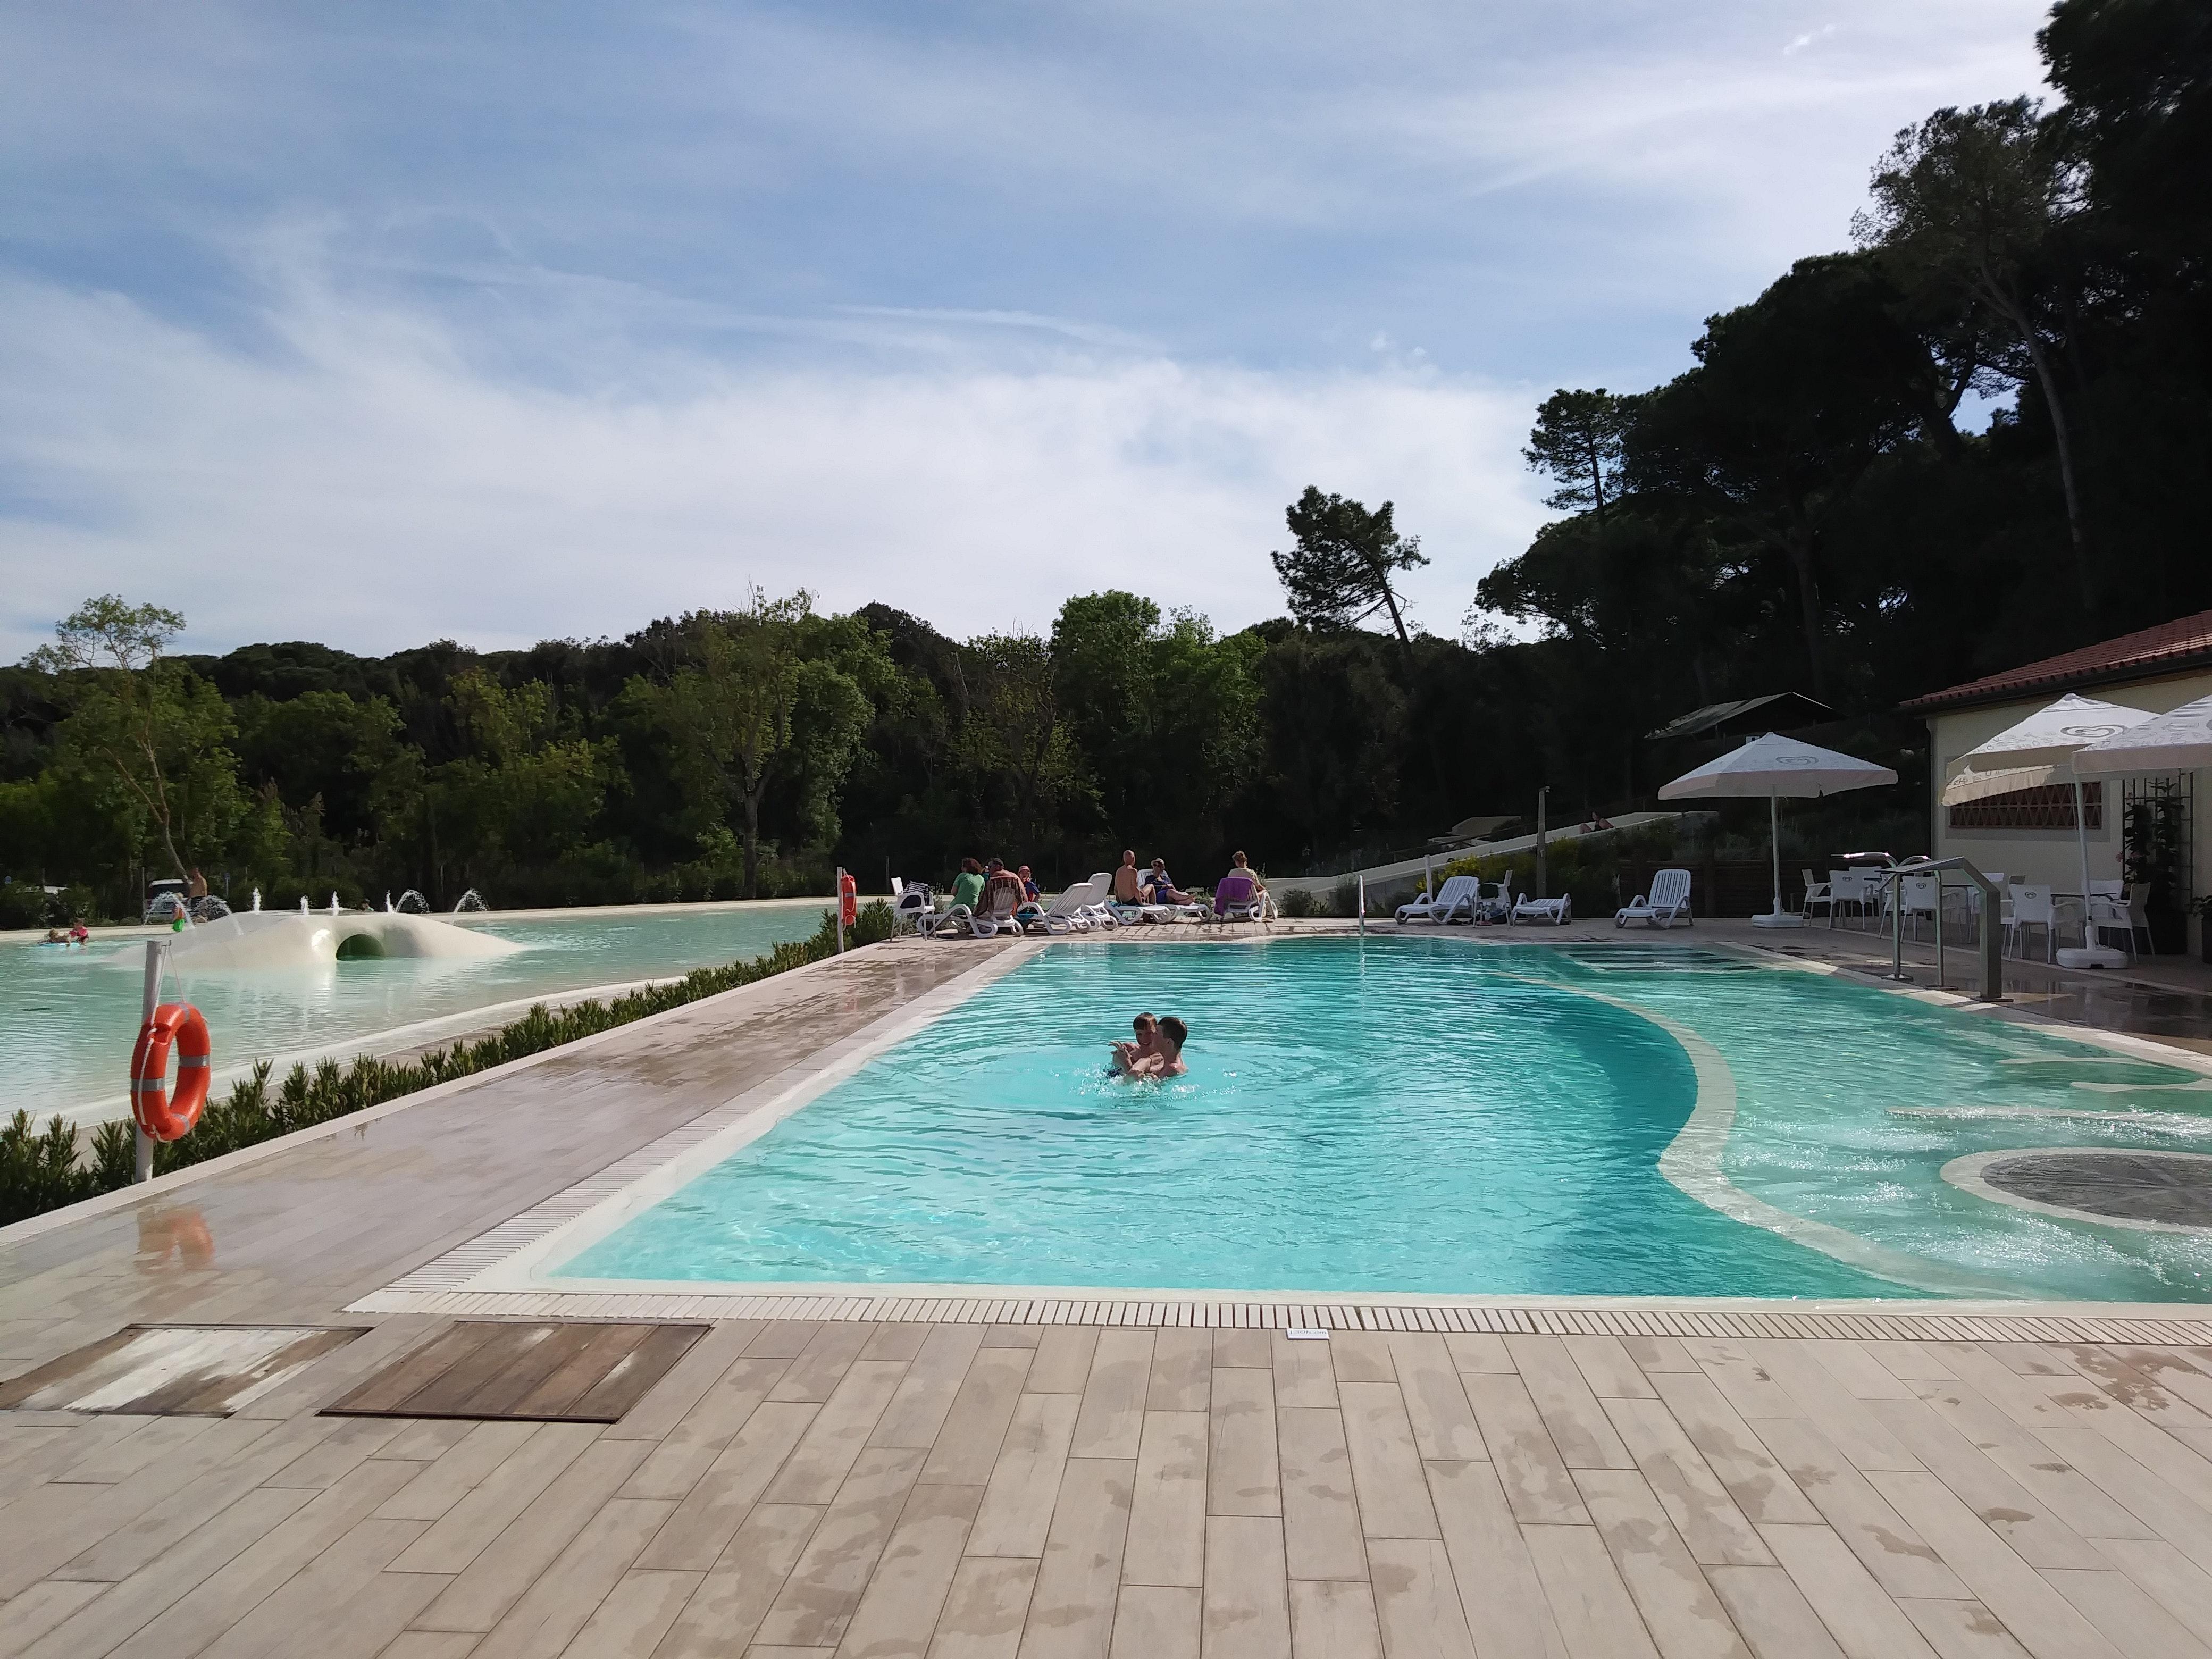 Camping Etruria zwembad